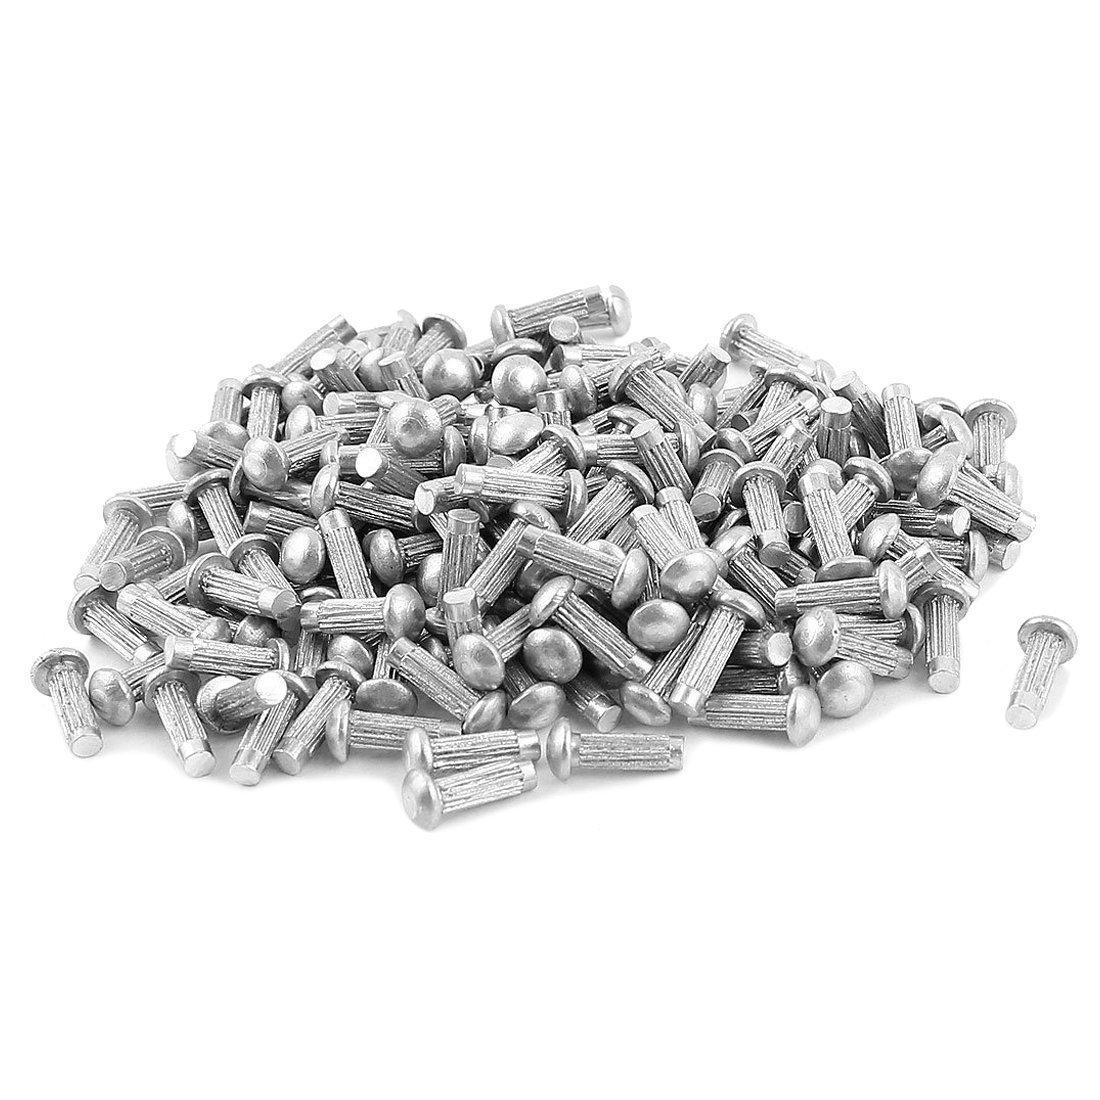 TOOGOO(R) 200 Pcs 3/32inch x 5/16inch Aluminium Round Head Solid Rivets Knurled Shanks